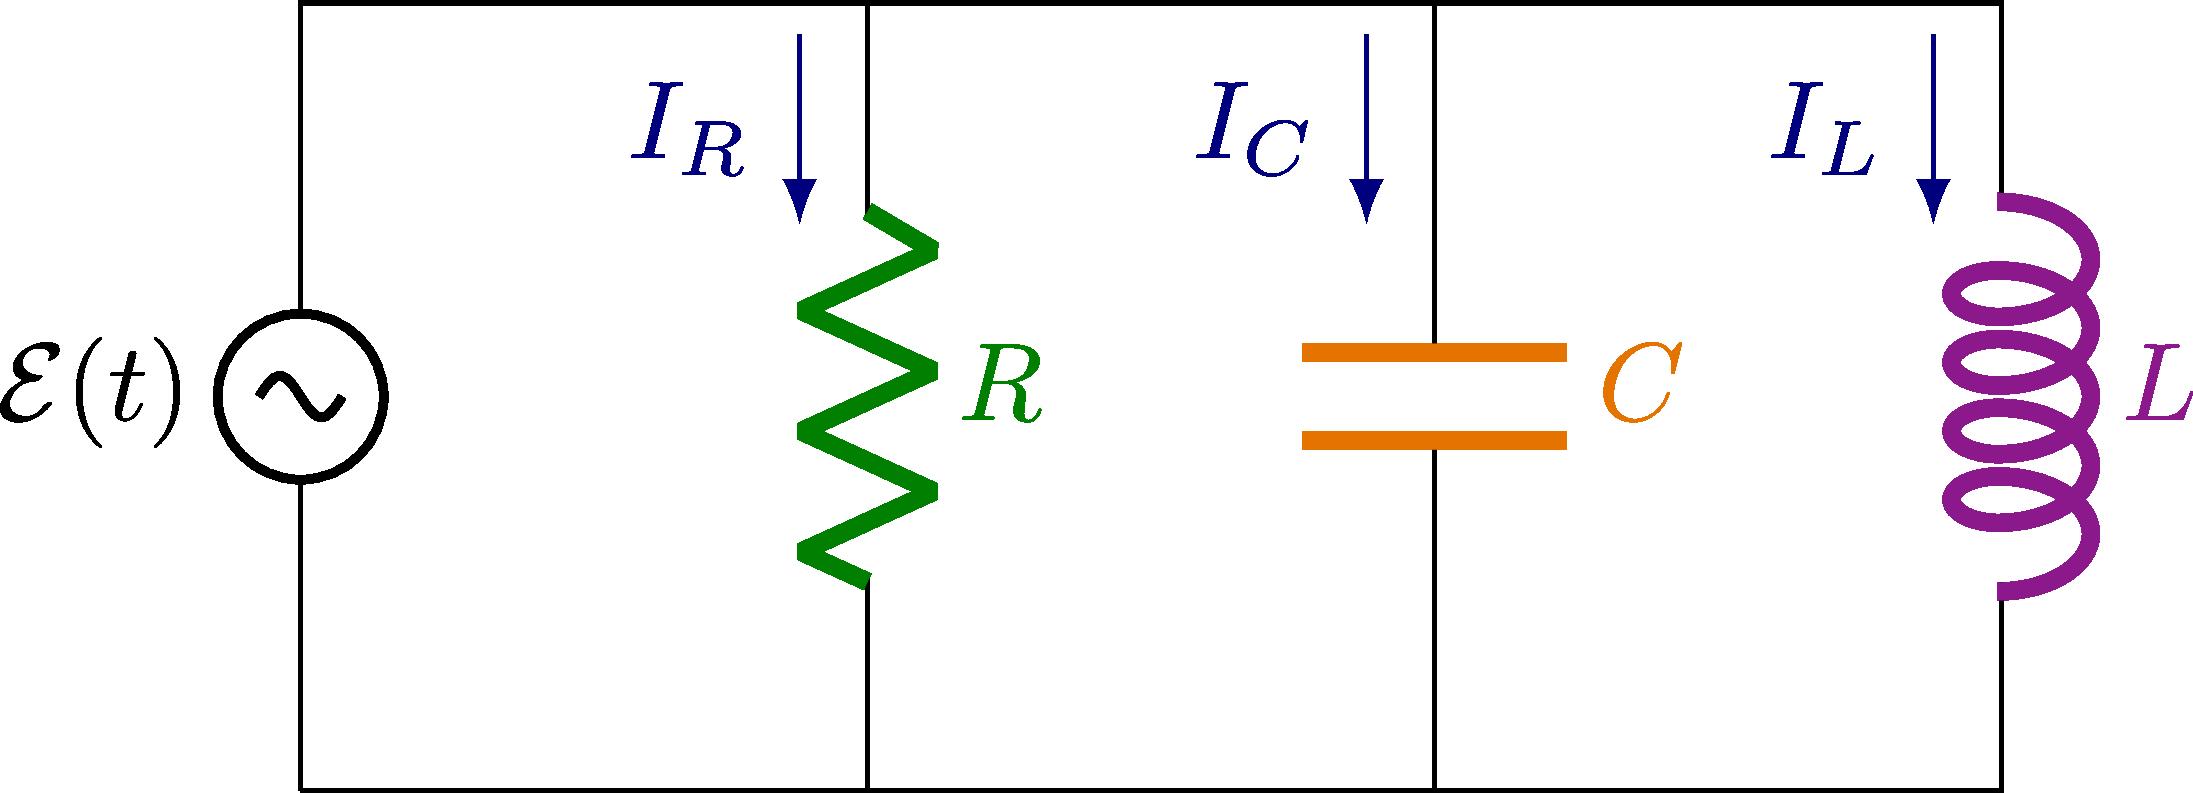 electric_circuit_ac-005.png